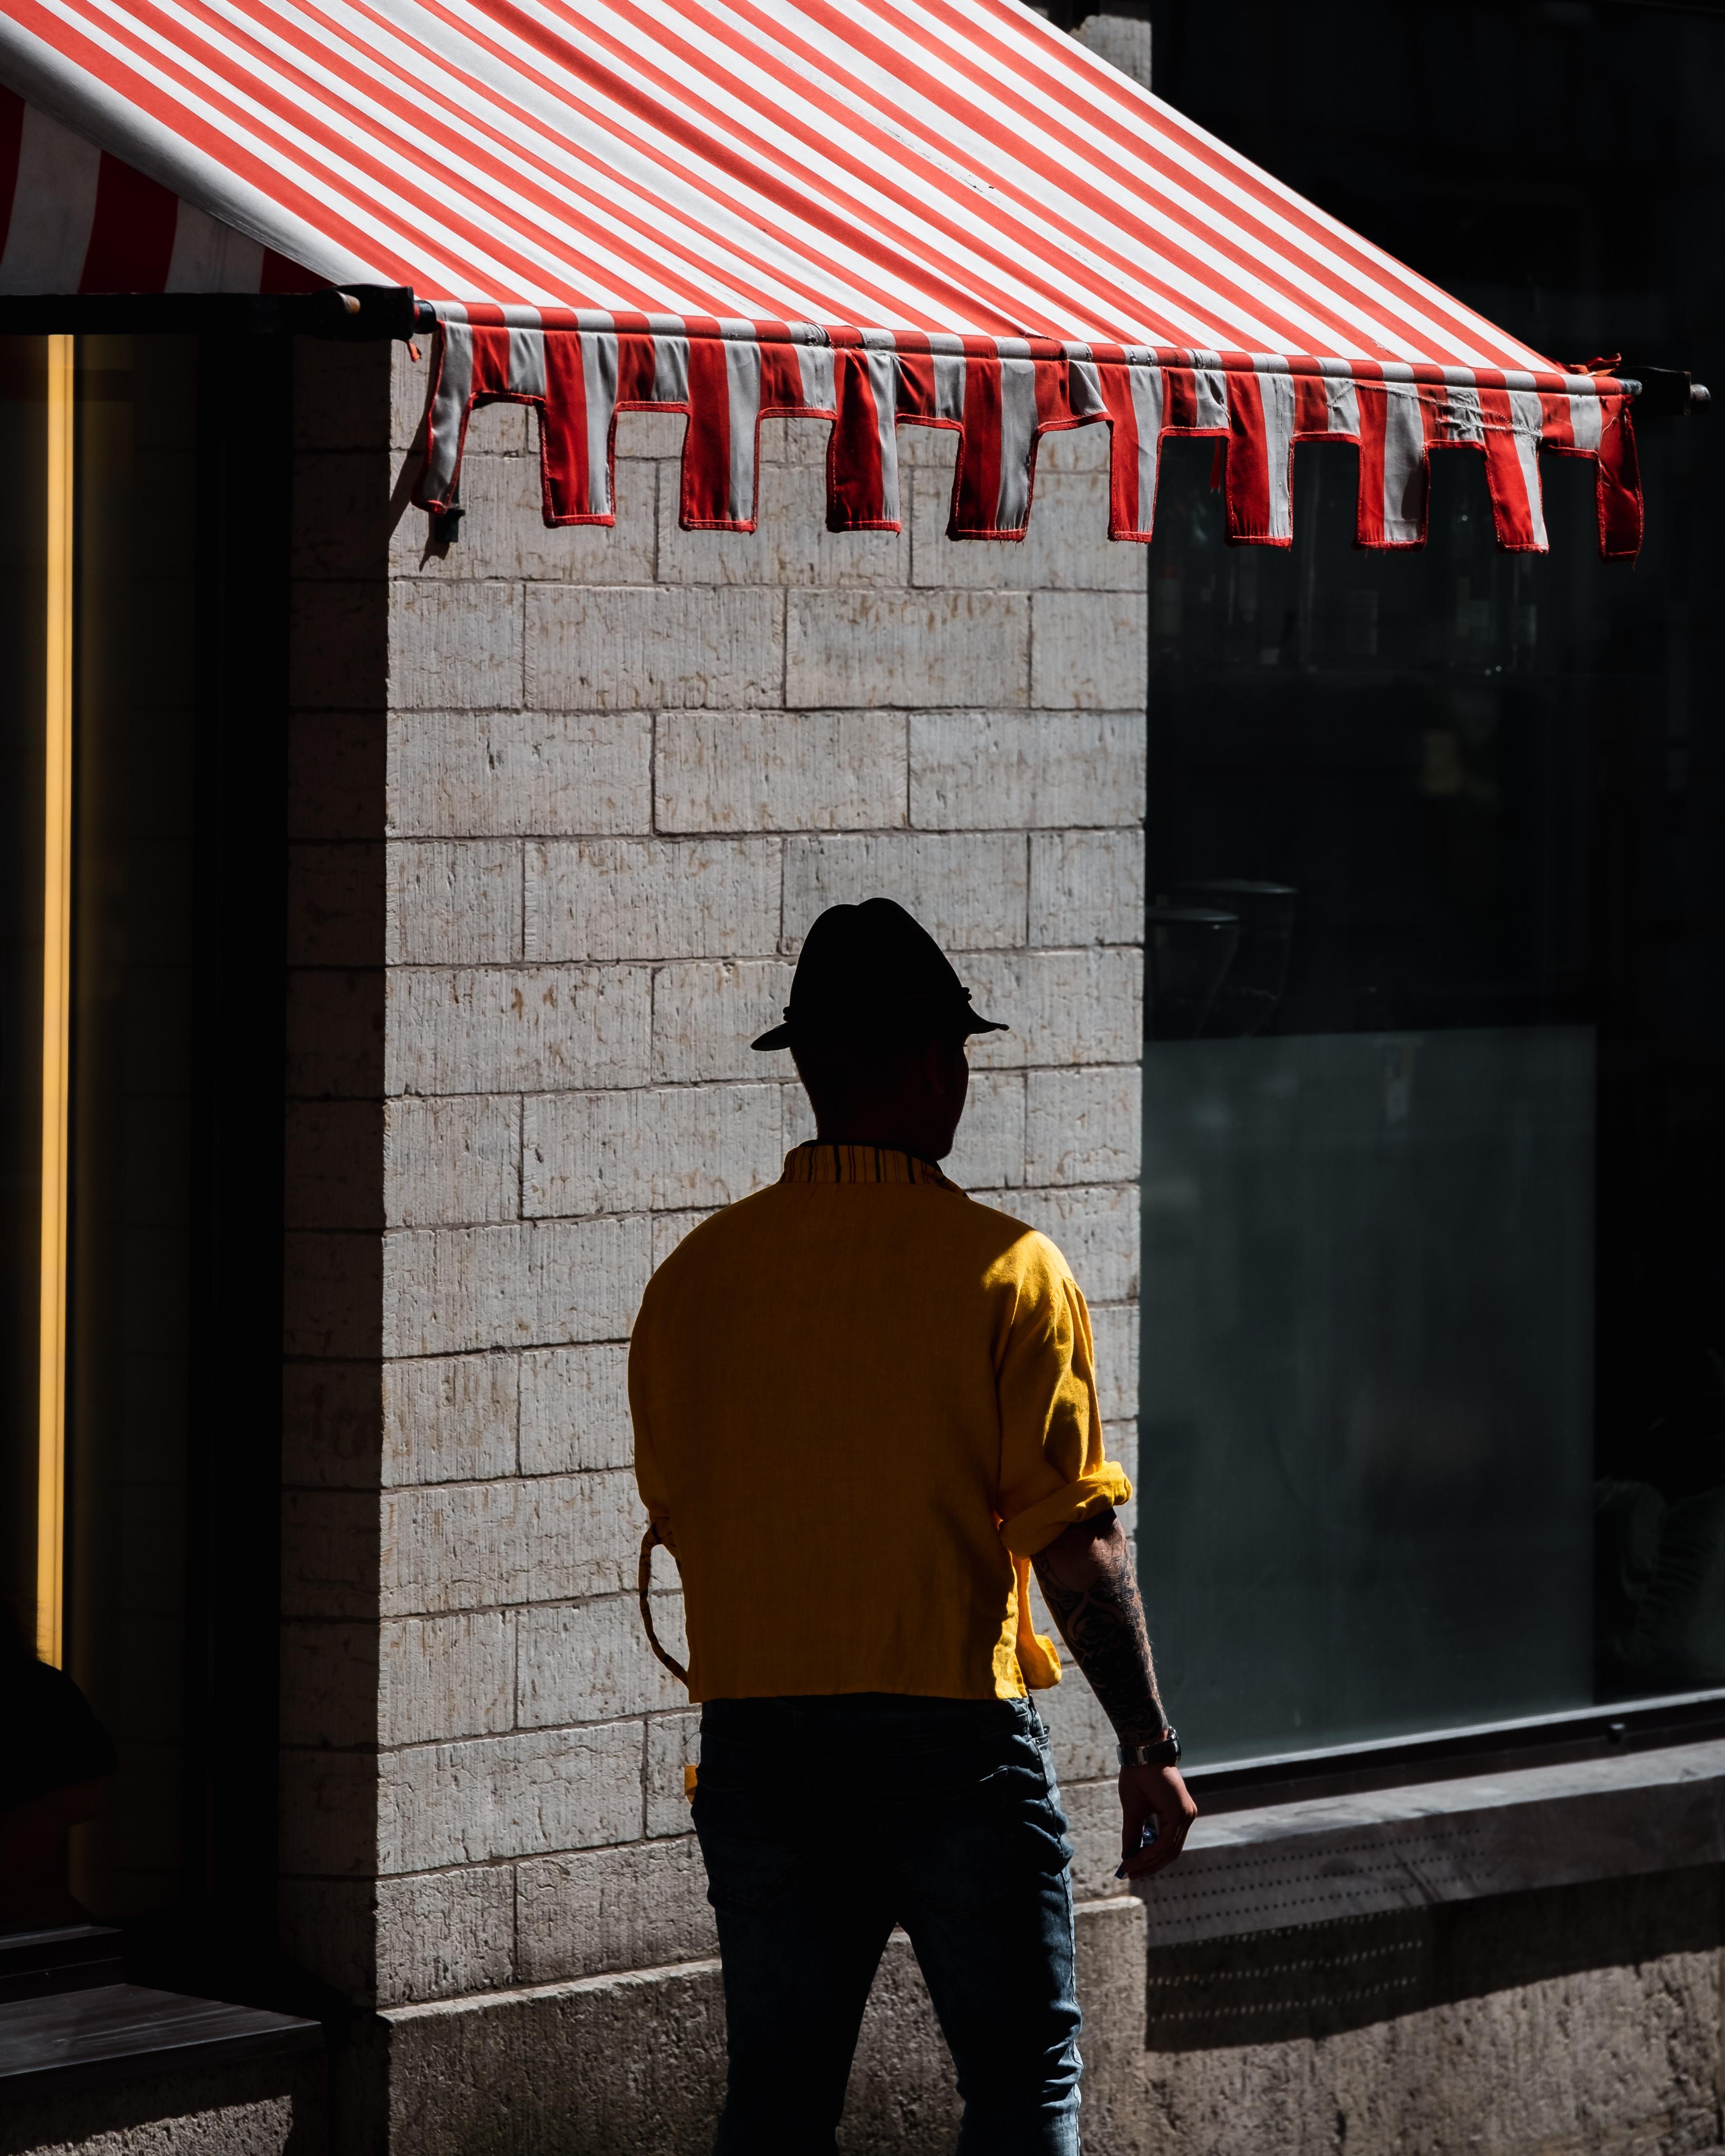 man walking under red and white striped awning during daytime